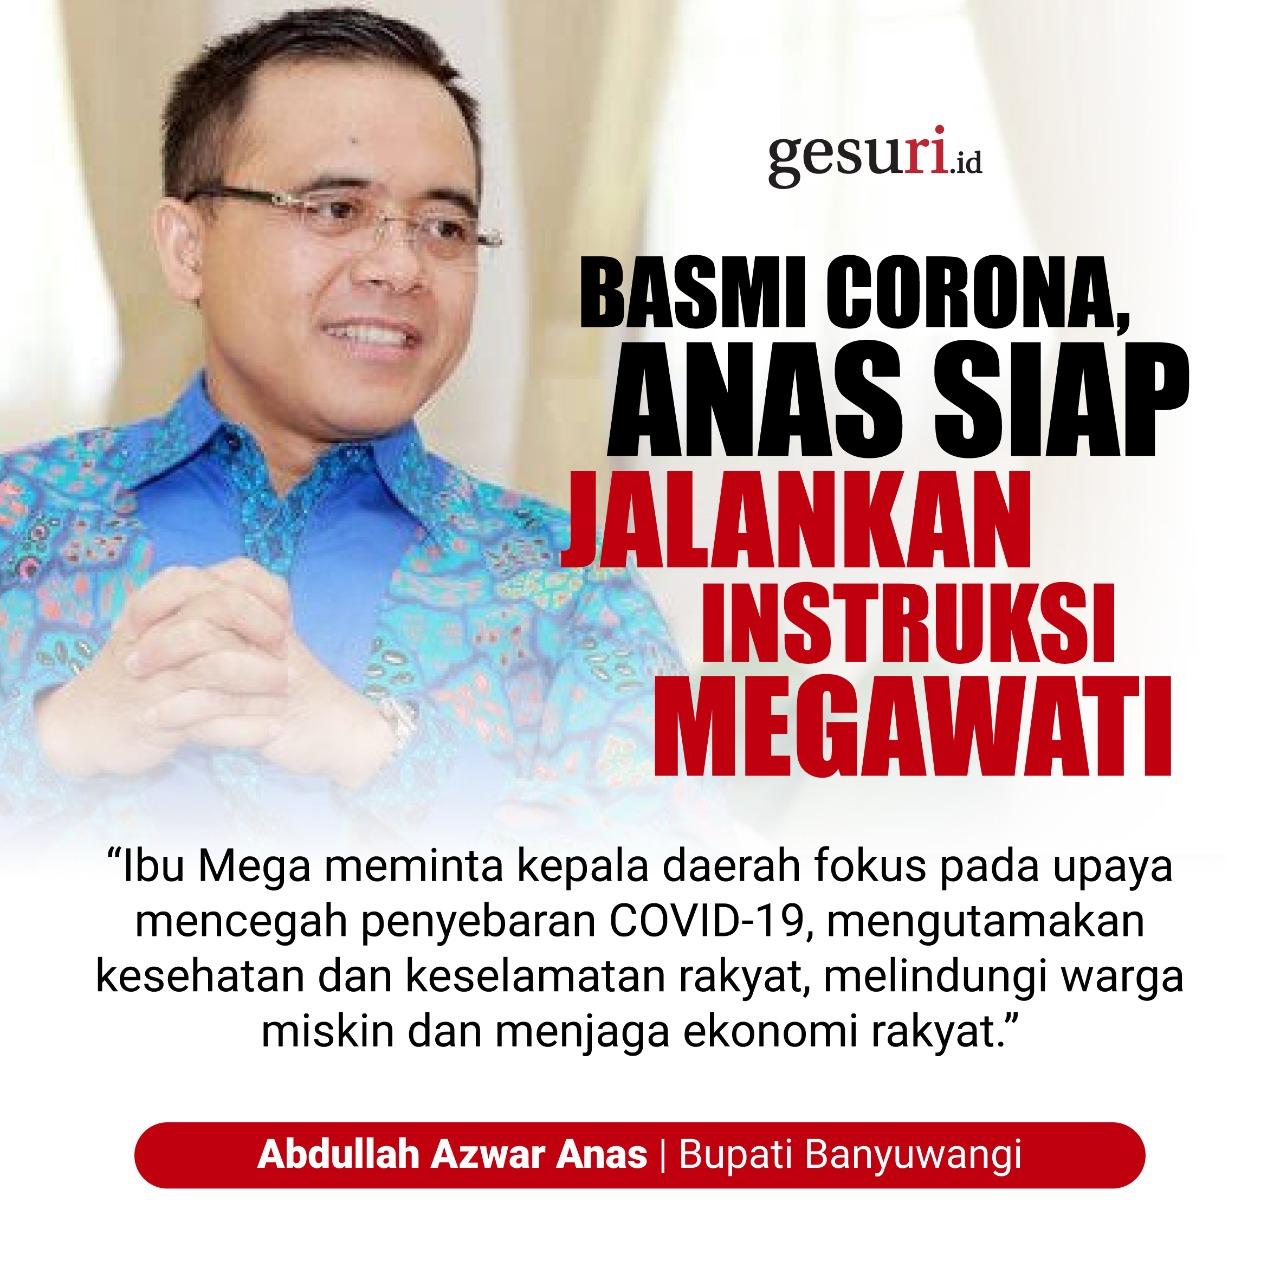 Basmi Corona, Anas Siap Jalankan Instruksi Megawati